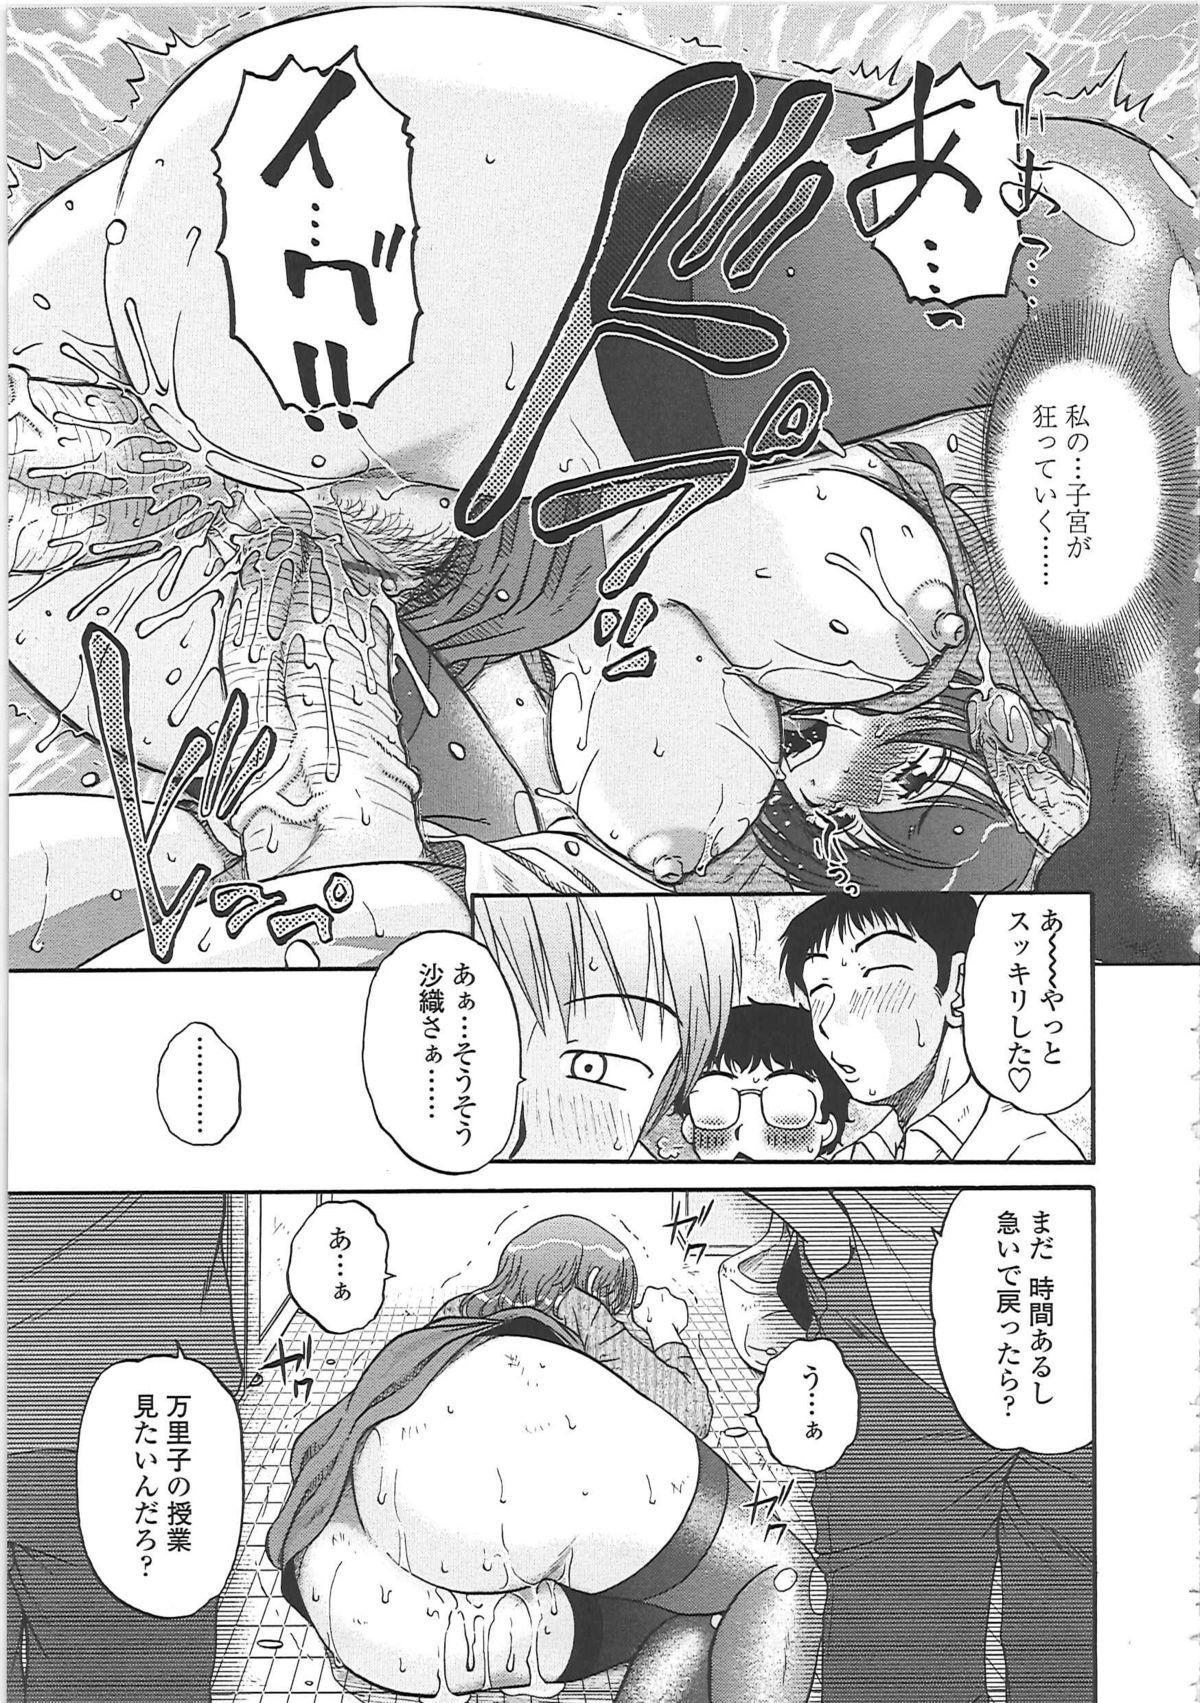 Nikuzuma Tsuushin - Erotic Wife Communication 129